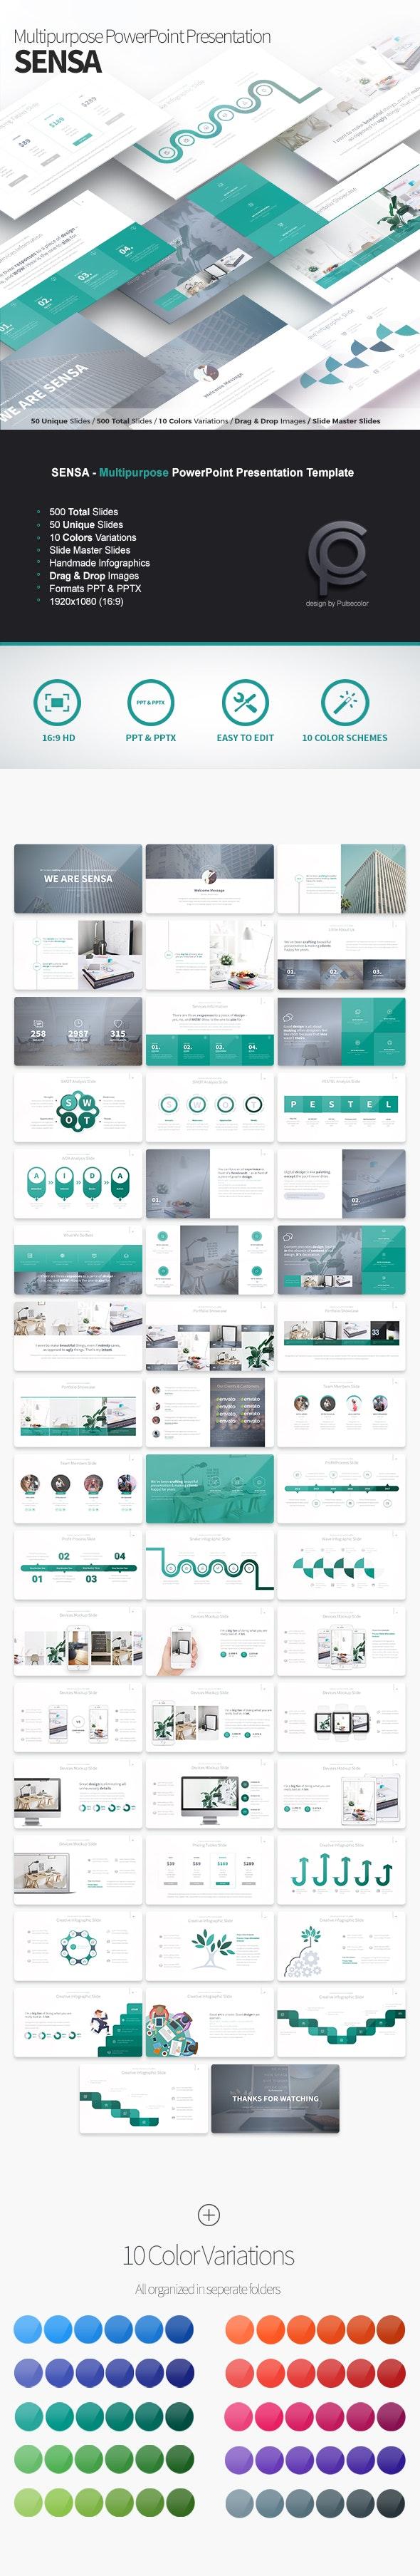 Sensa - Multipurpose PowerPoint Presentation Template - Business PowerPoint Templates